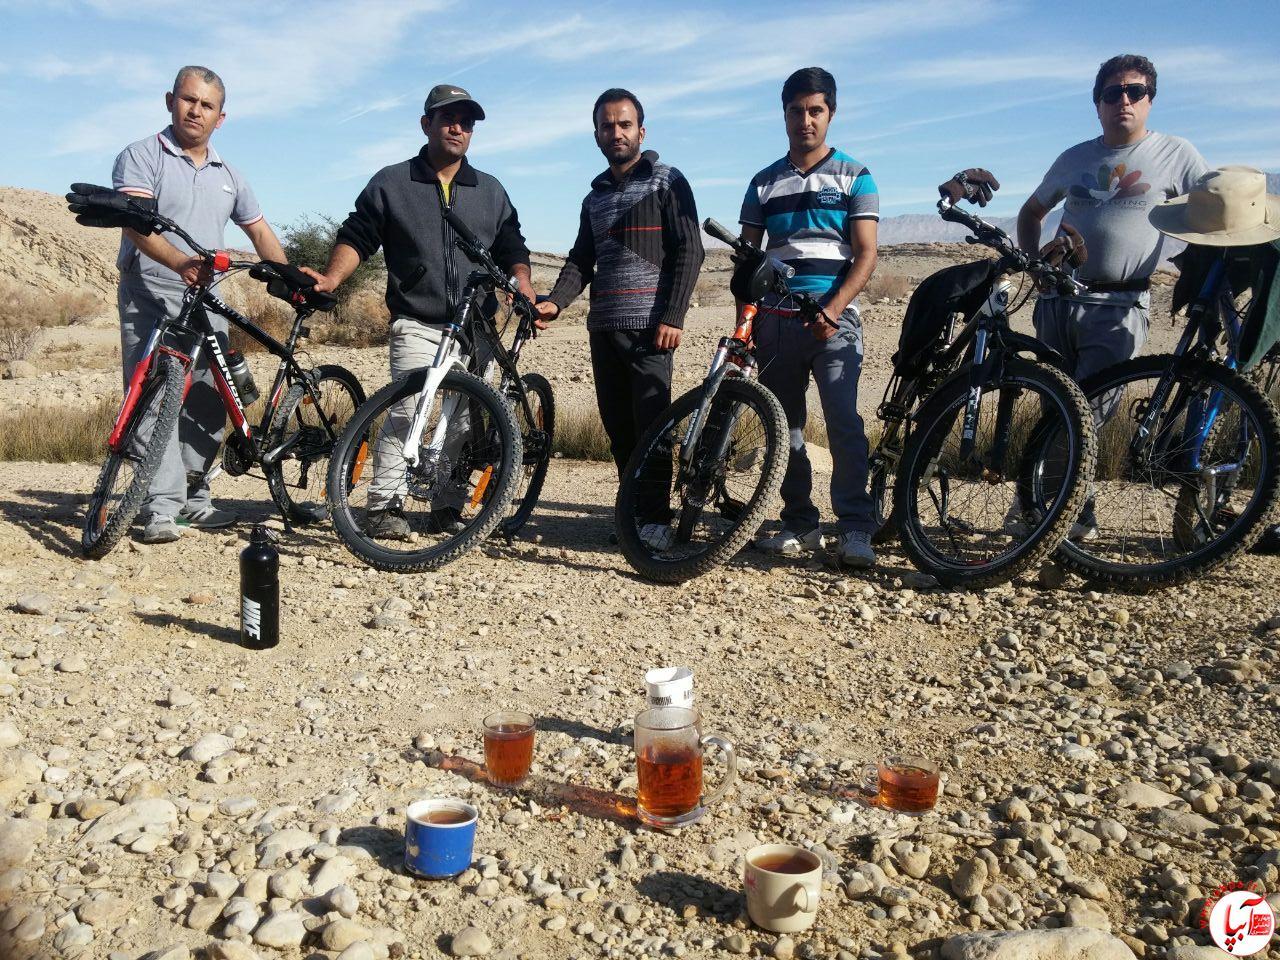 IMG-20170201-WA0006 توسعه فرهنگی با رکاب دوچرخه سواران